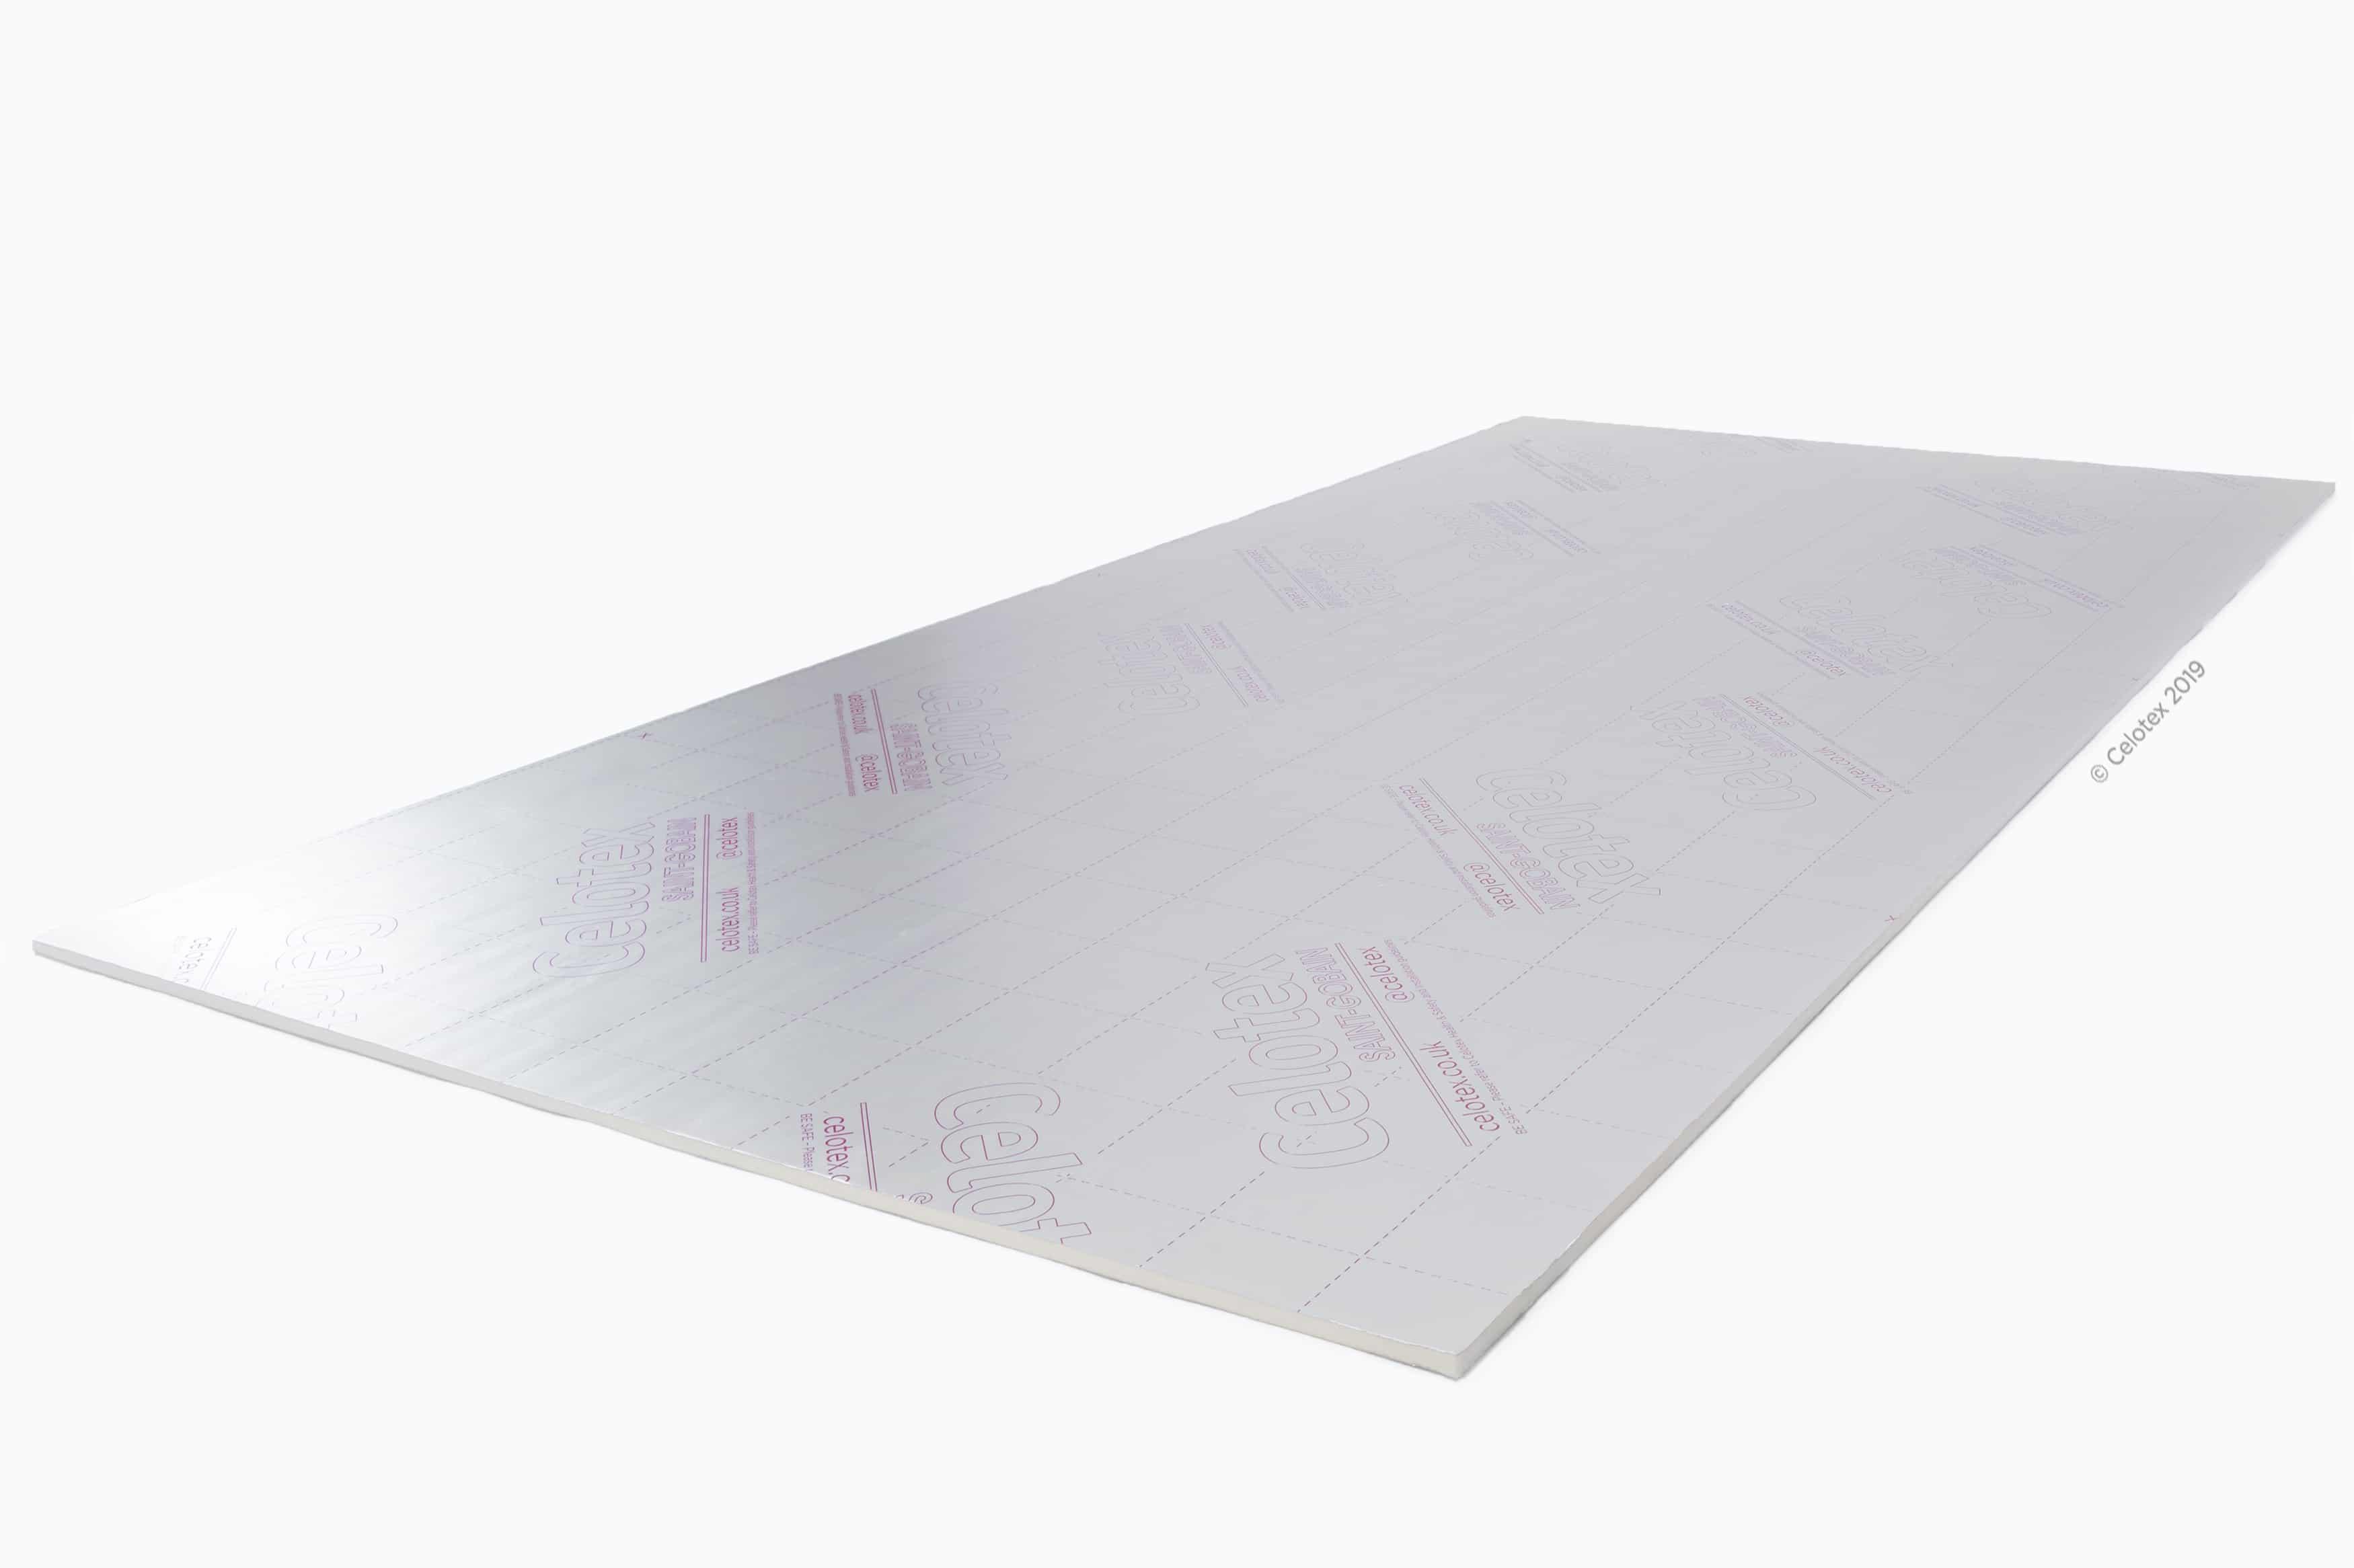 celotex TB4000 insulation board, thermal bridging insulation board